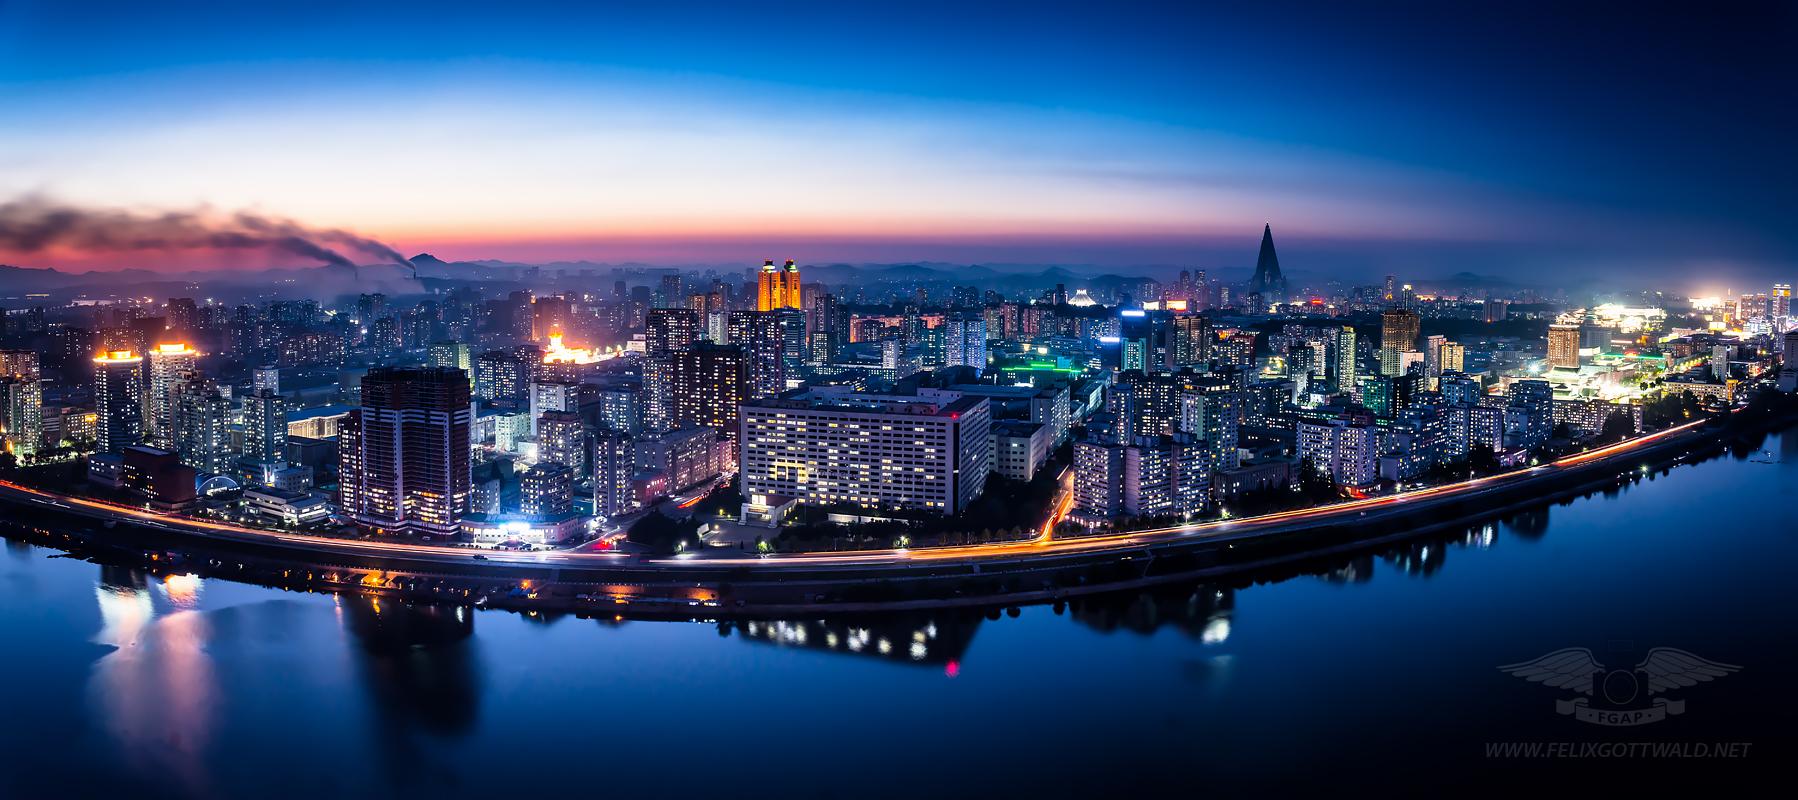 Pyongyang at night - Panorama